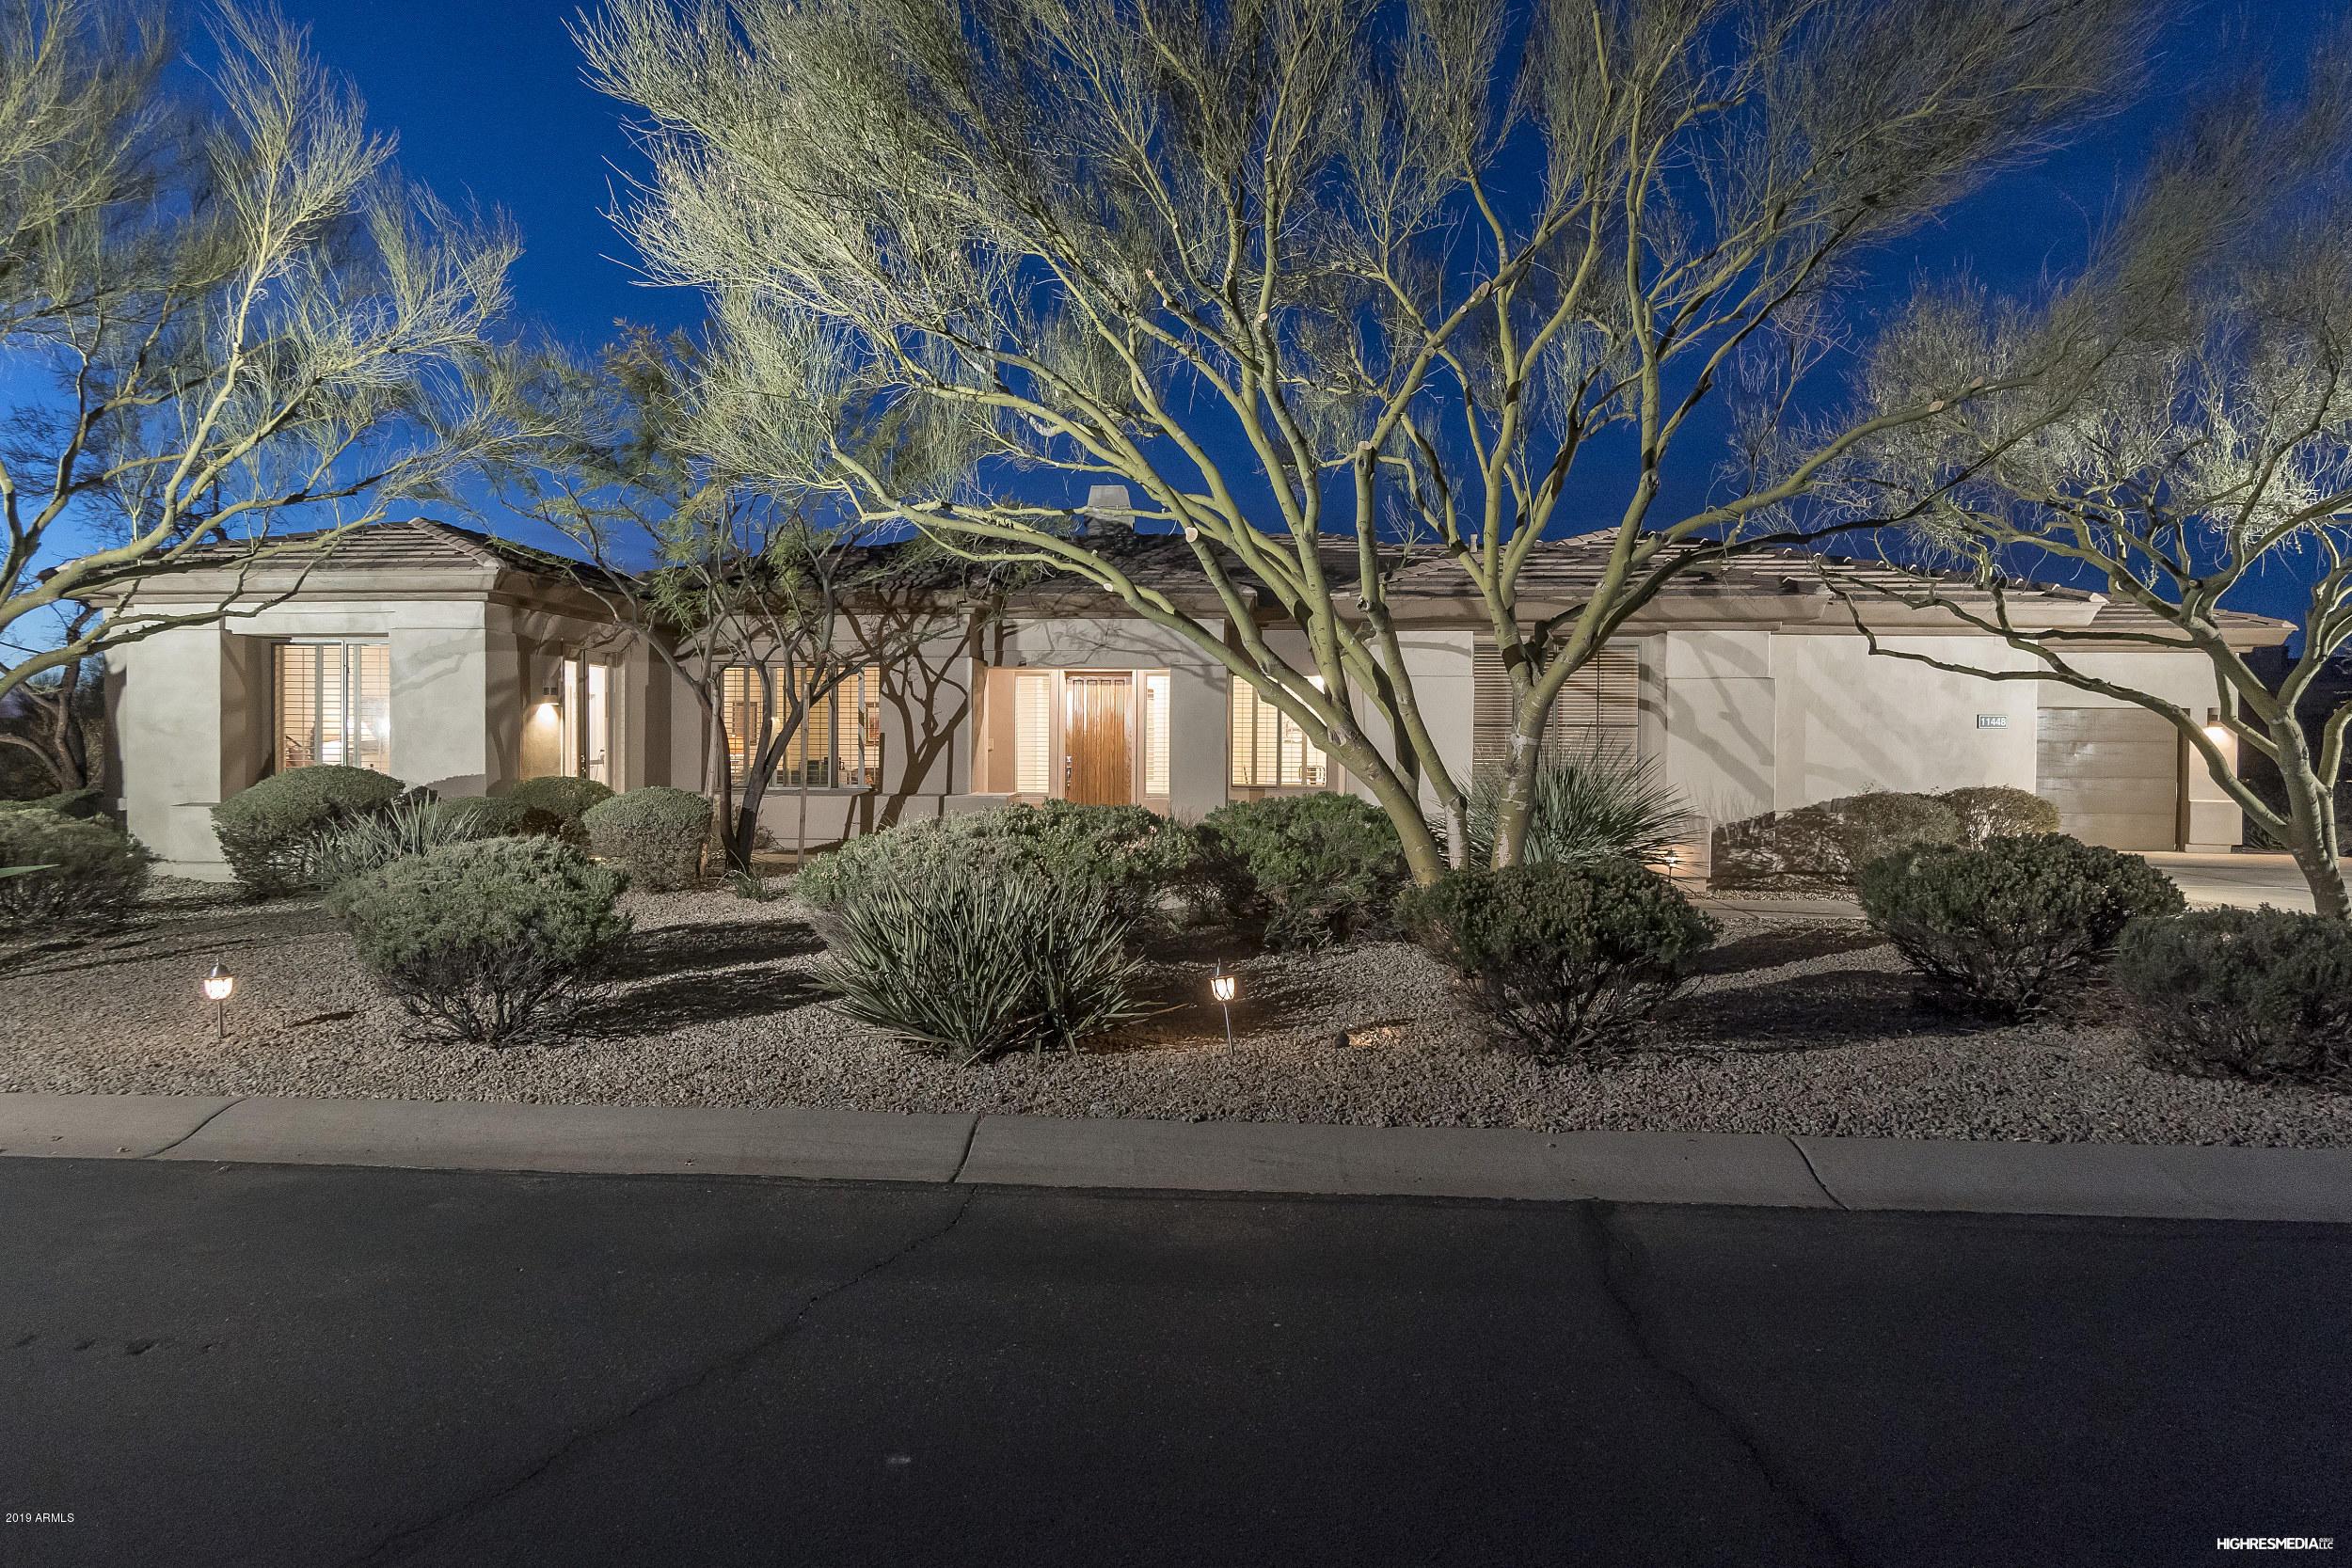 MLS 5871697 11448 E FOUR PEAKS Road, Scottsdale, AZ 85262 Scottsdale AZ Desert Summit